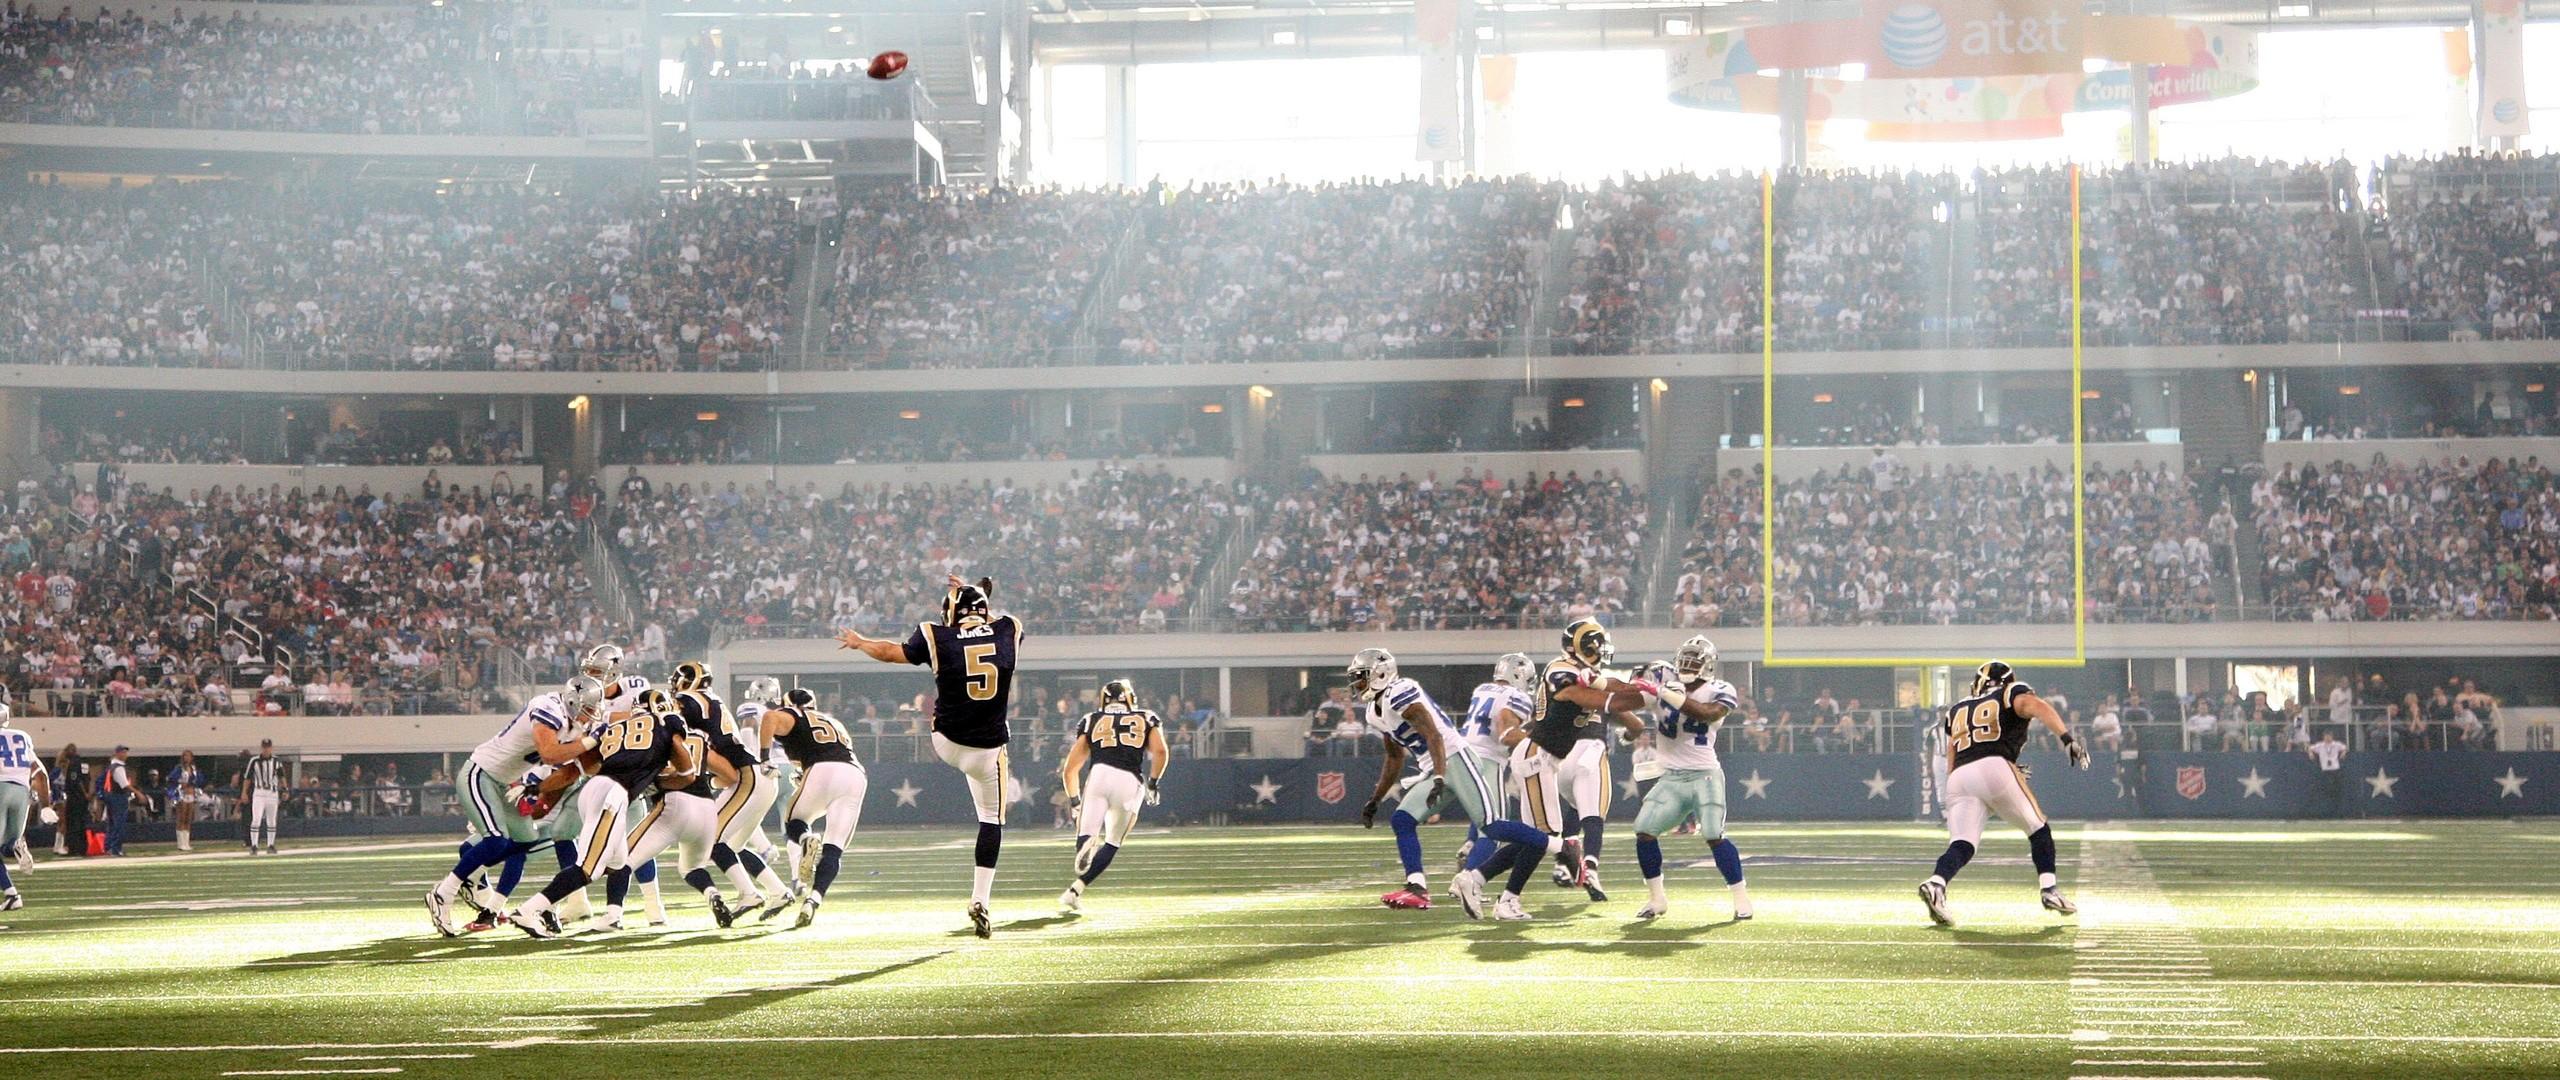 0 American Football Wallpapers for Desktop American Football Wallpapers for  Facebook Full HD Pictures